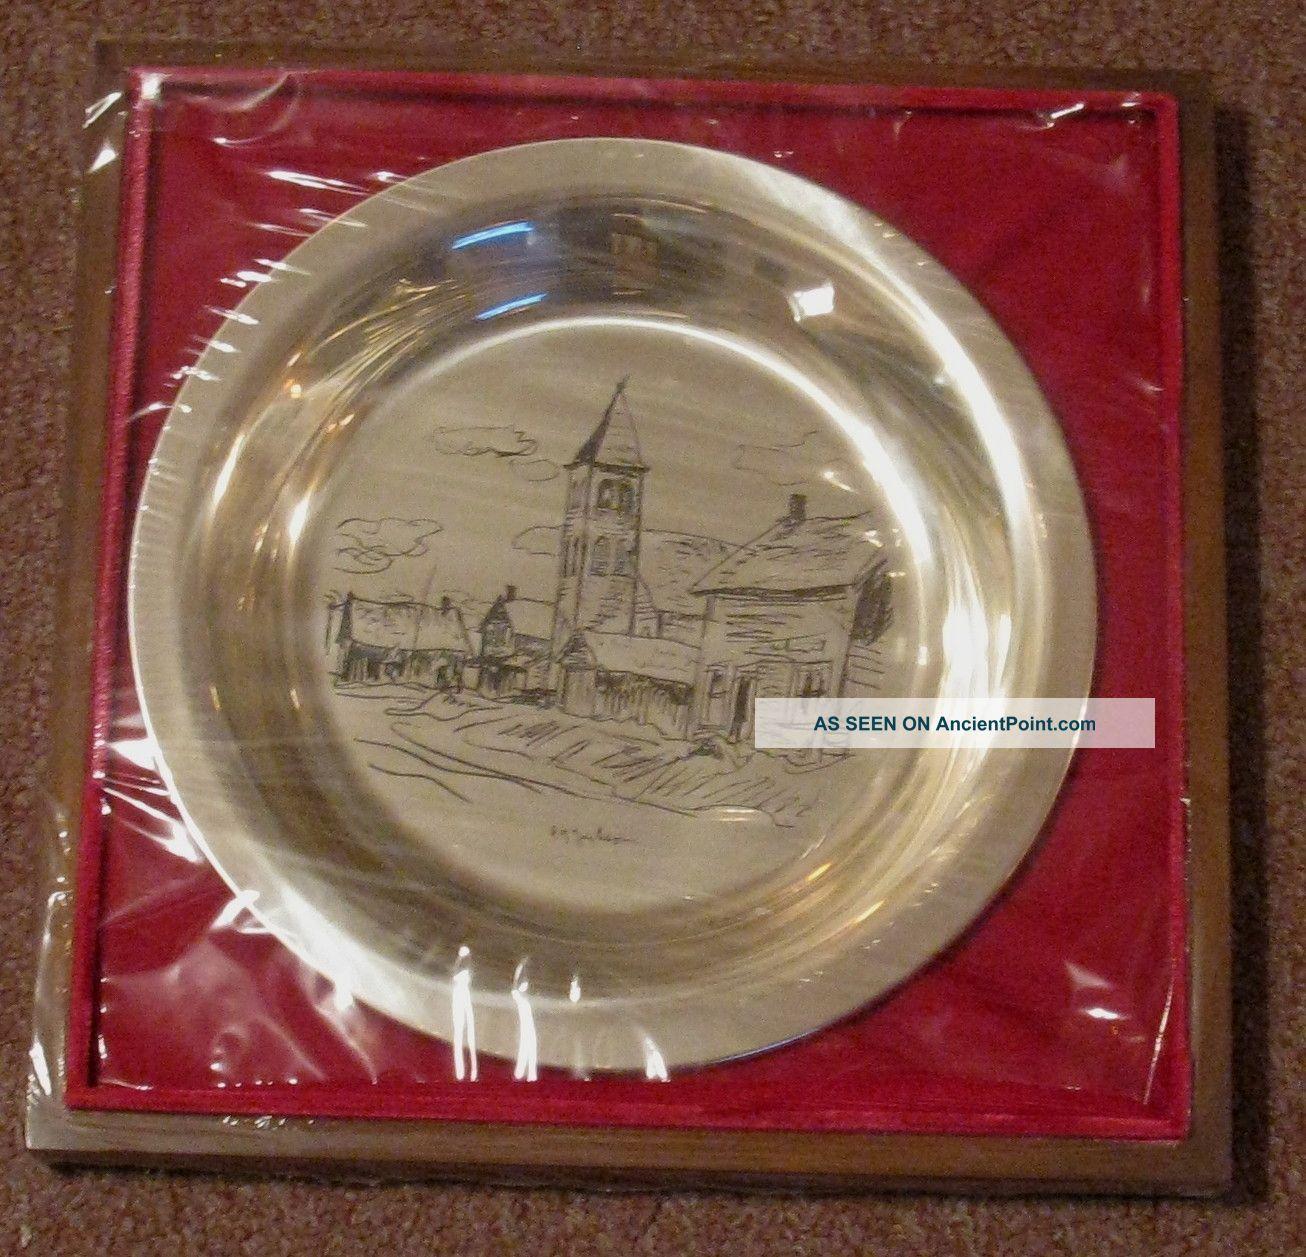 1976 Franklin Mint Sterling Silver Plate A.  Yjackson